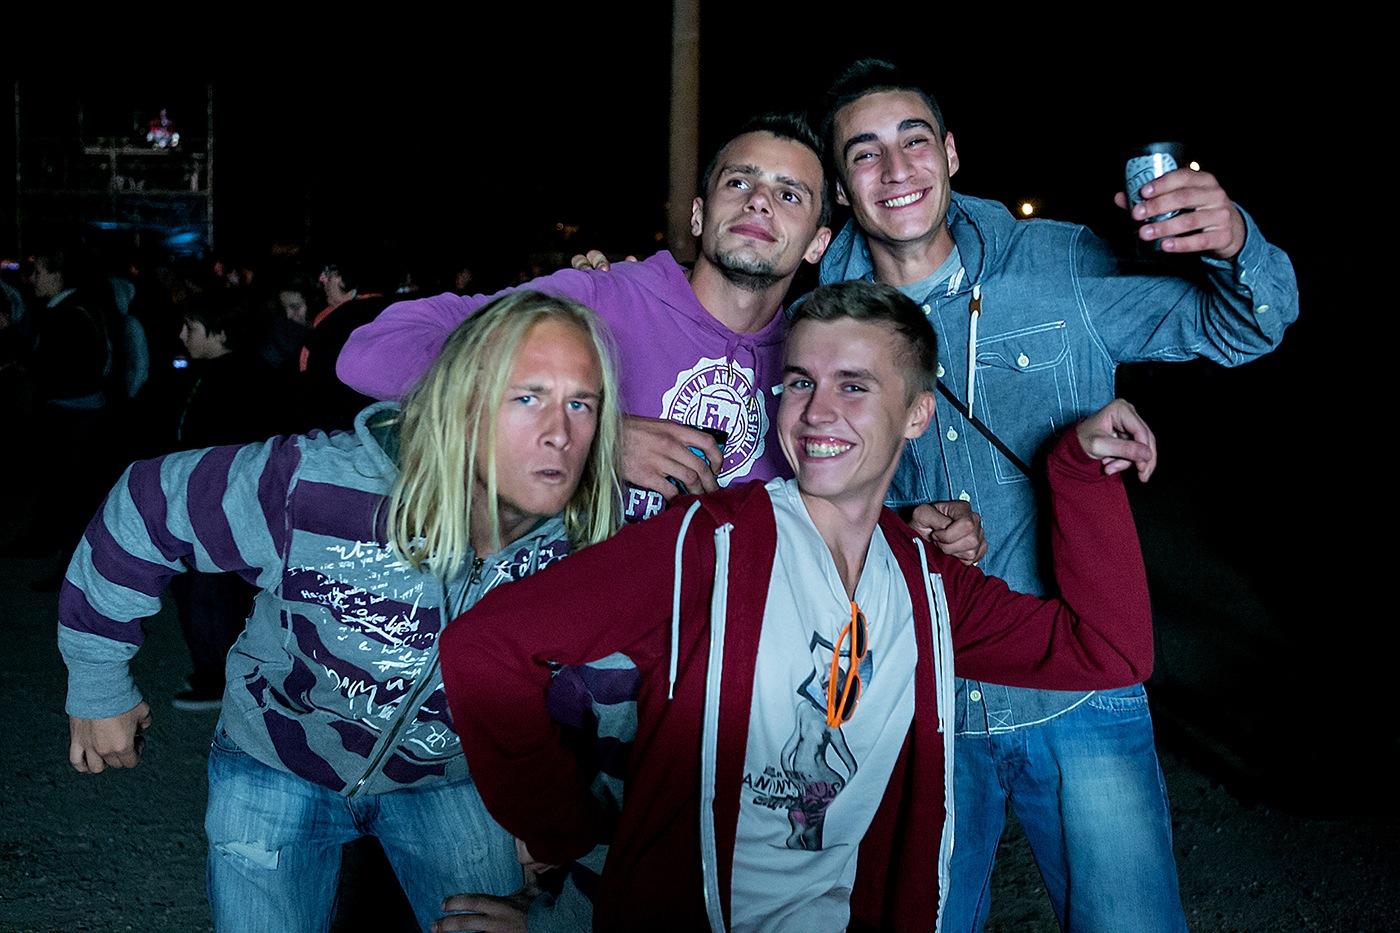 photographe-reportage-festival-rockadel-guillaume-heraud-035-small